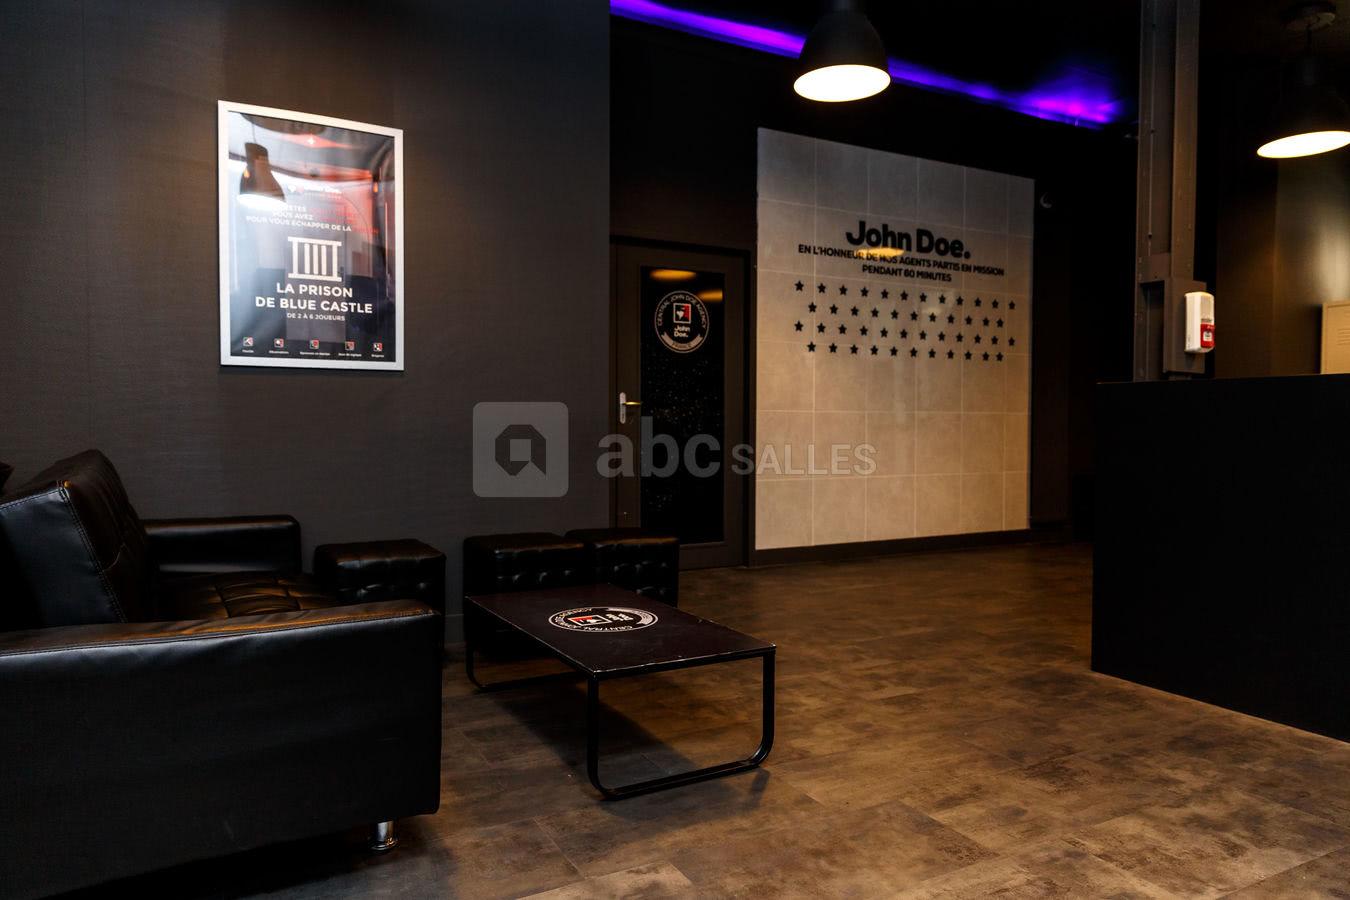 john doe escape game nantes abc salles. Black Bedroom Furniture Sets. Home Design Ideas